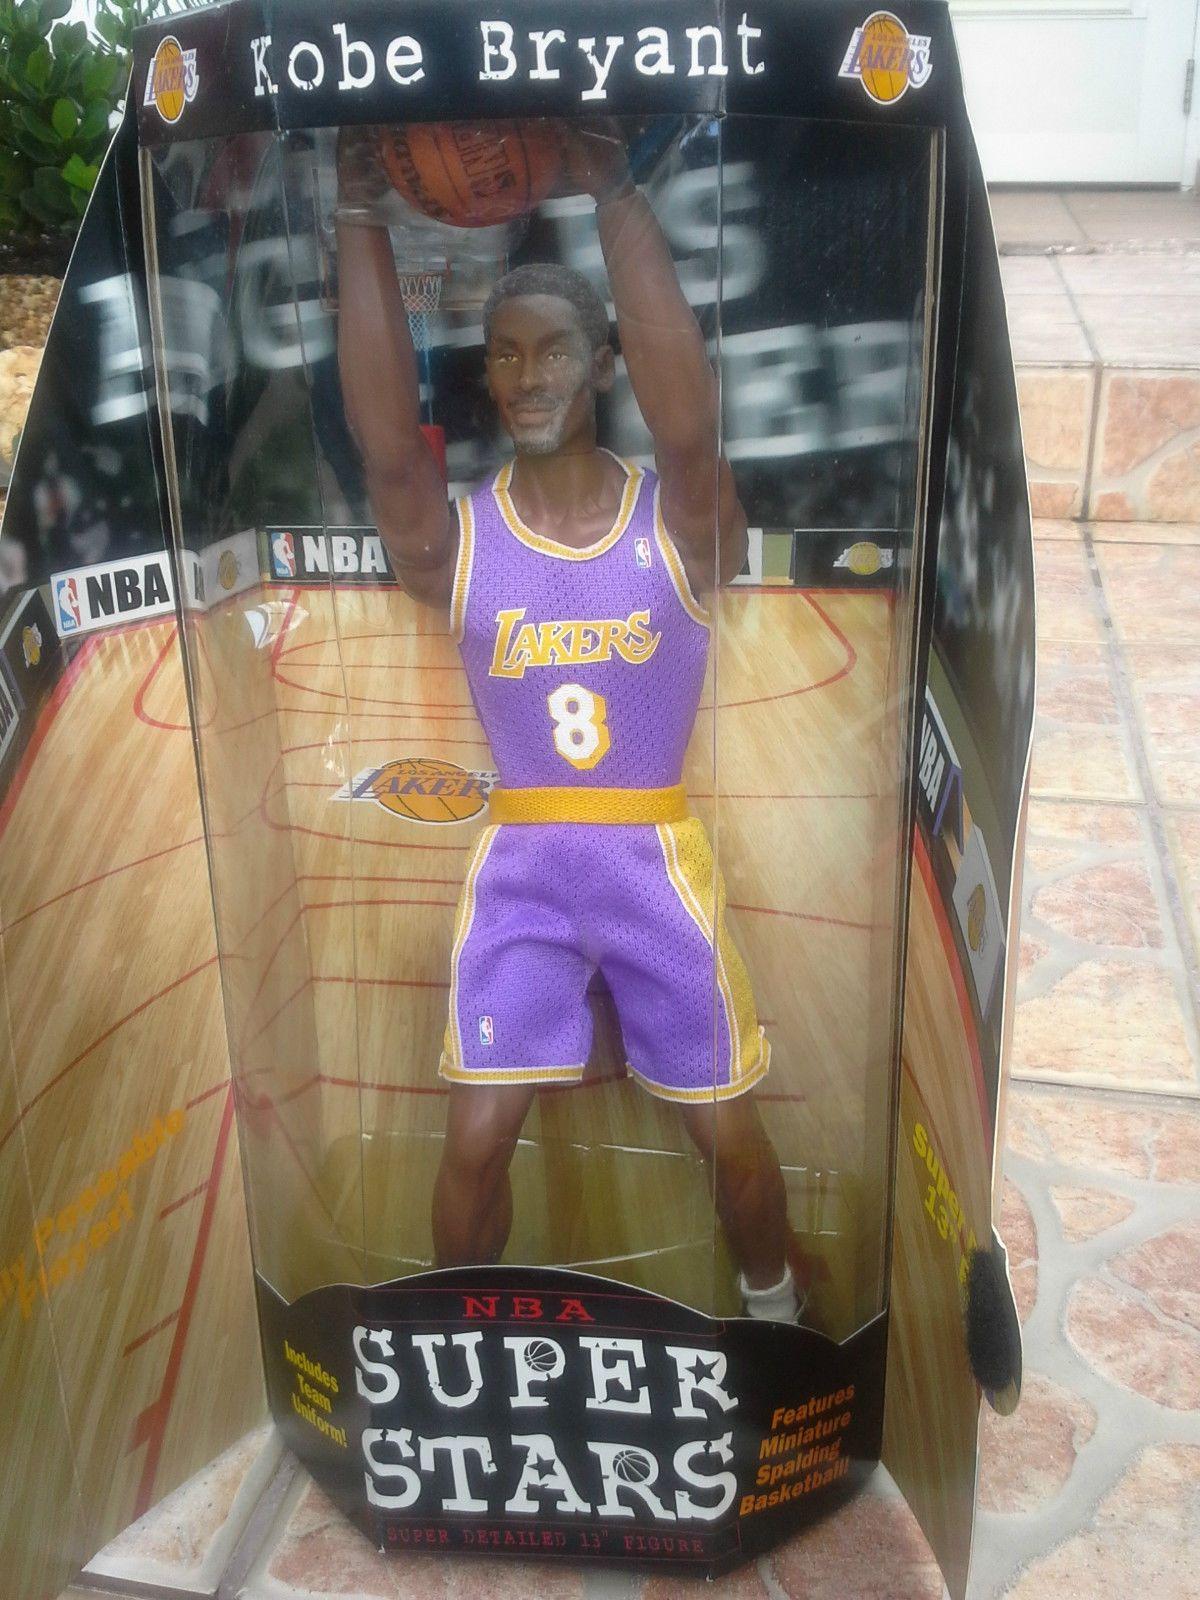 Mattel Nba Super Stars 13 Figure Kobe Bryant Los Angeles Lakers Kobe Bryant Kobe Bryant Nba Los Angeles Lakers